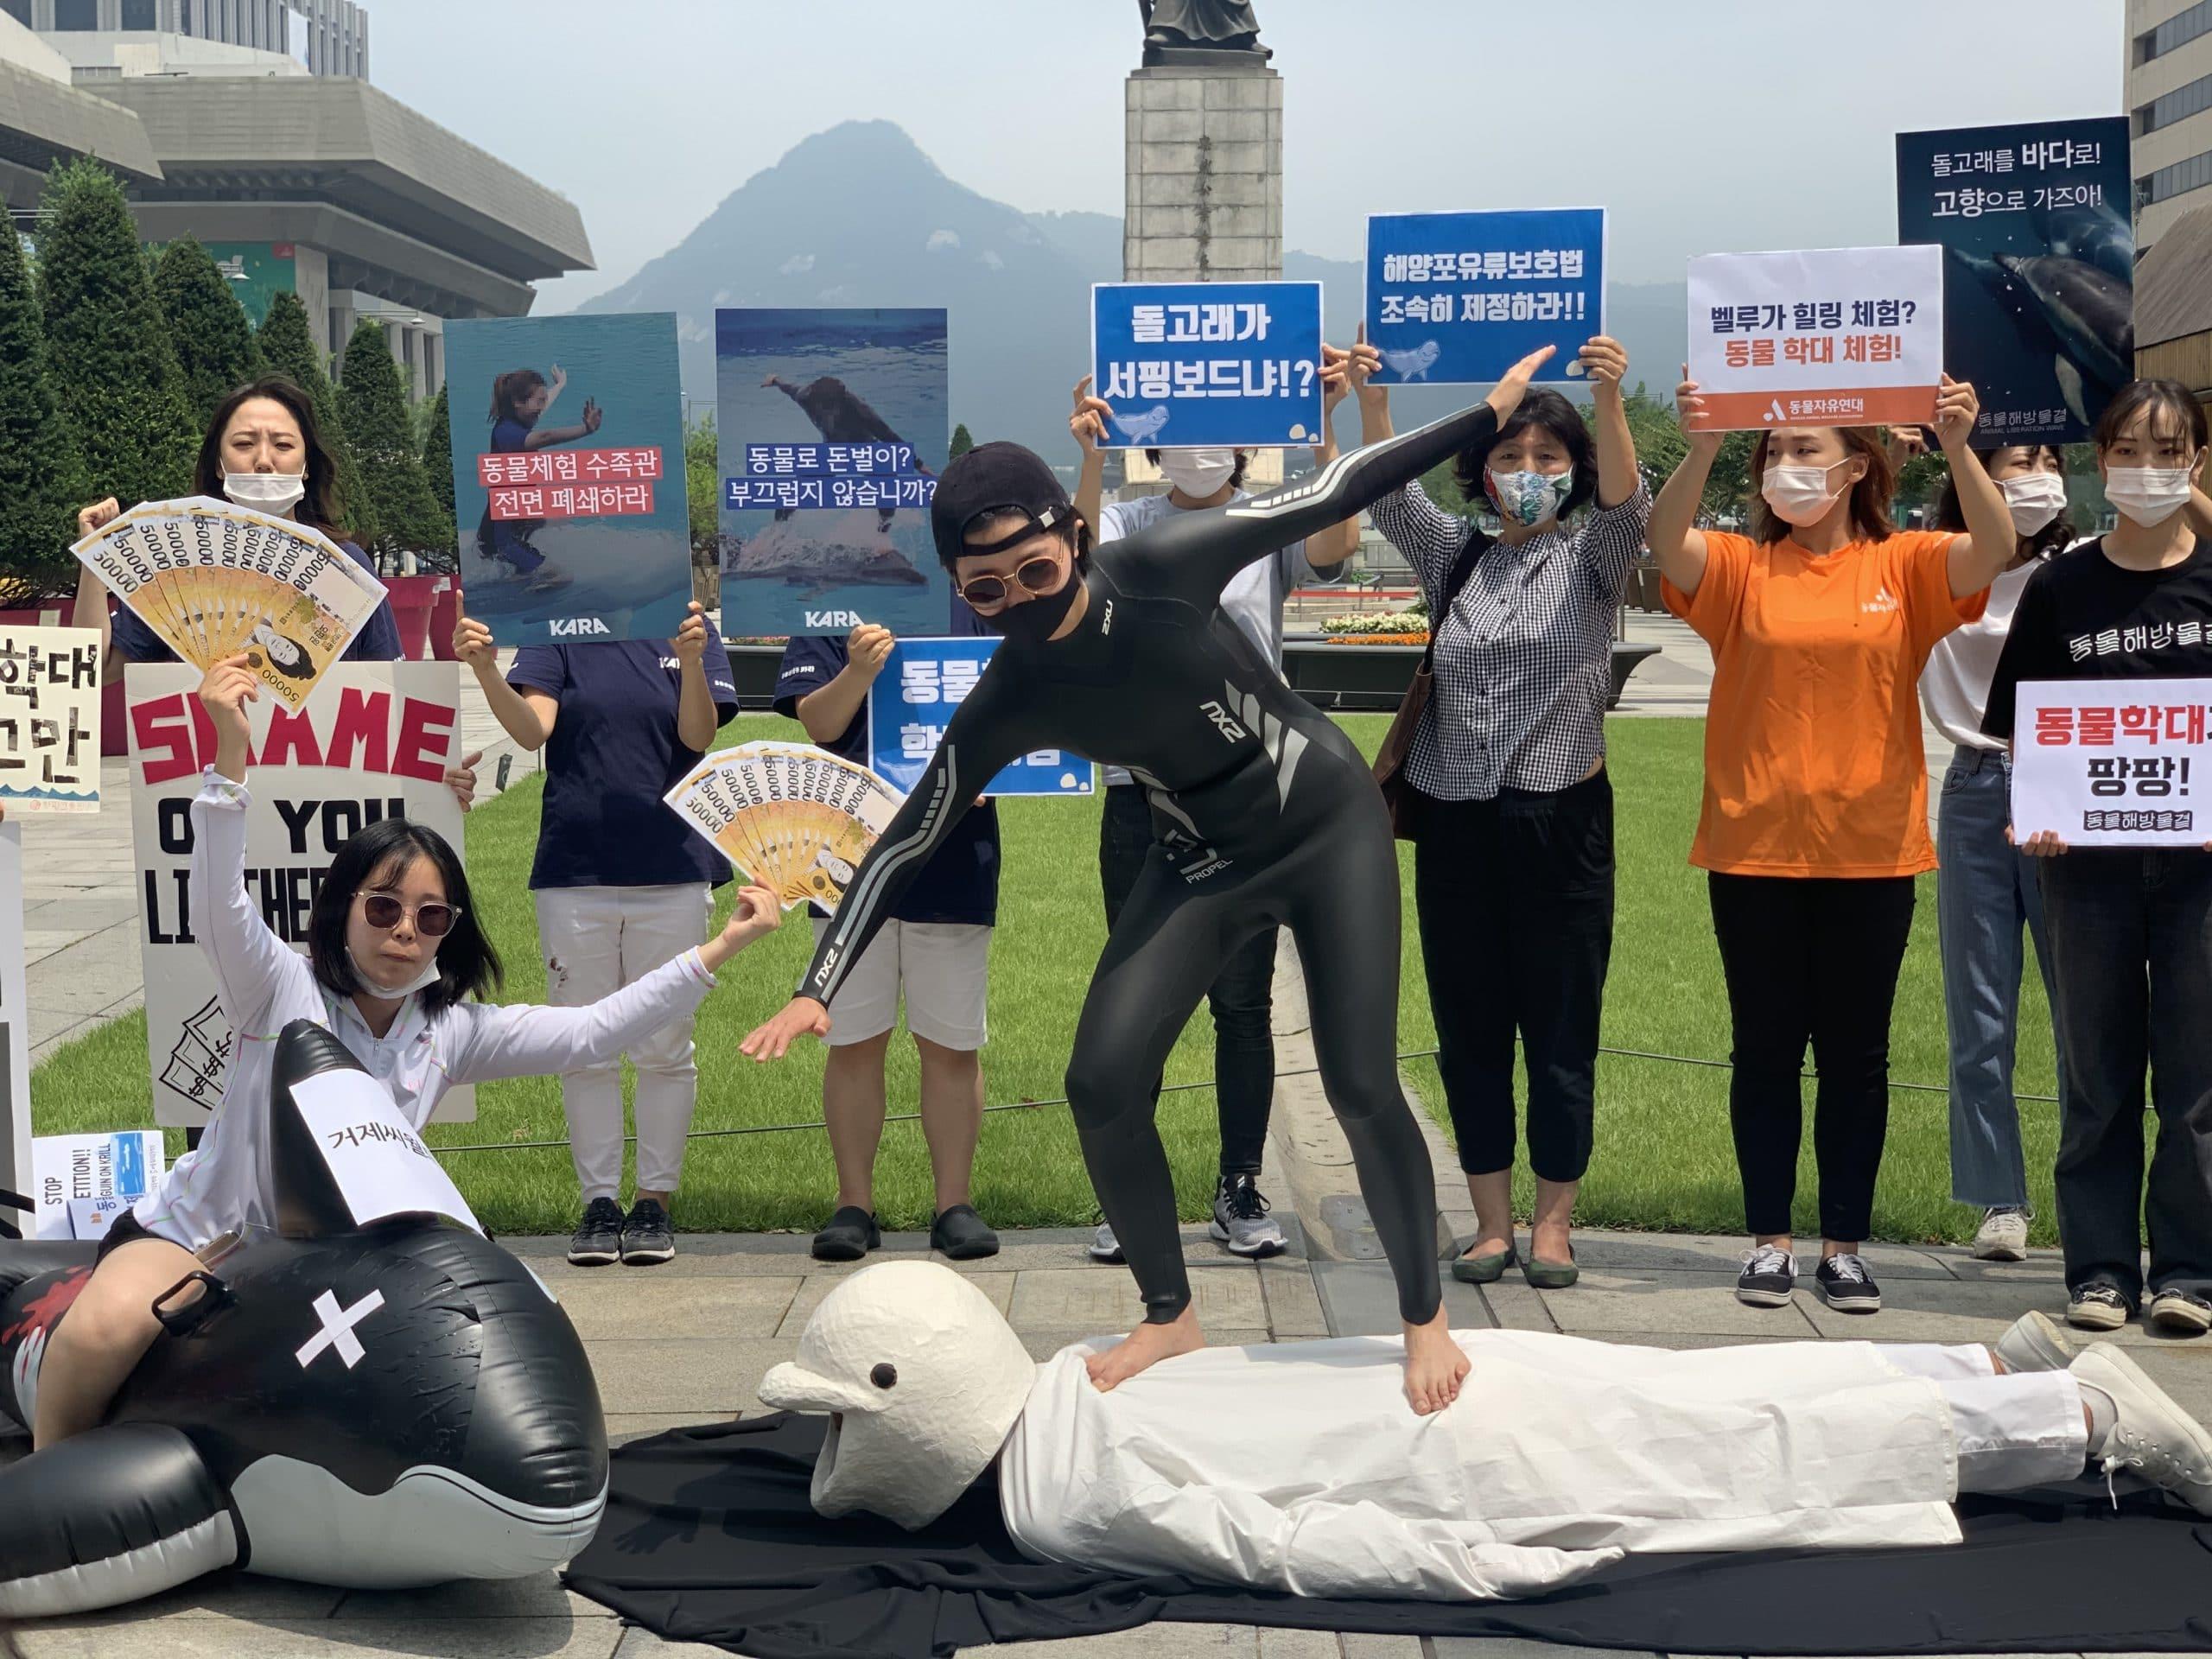 Protesters demand the closure of Geoje Sea World in South Korea © KAWA